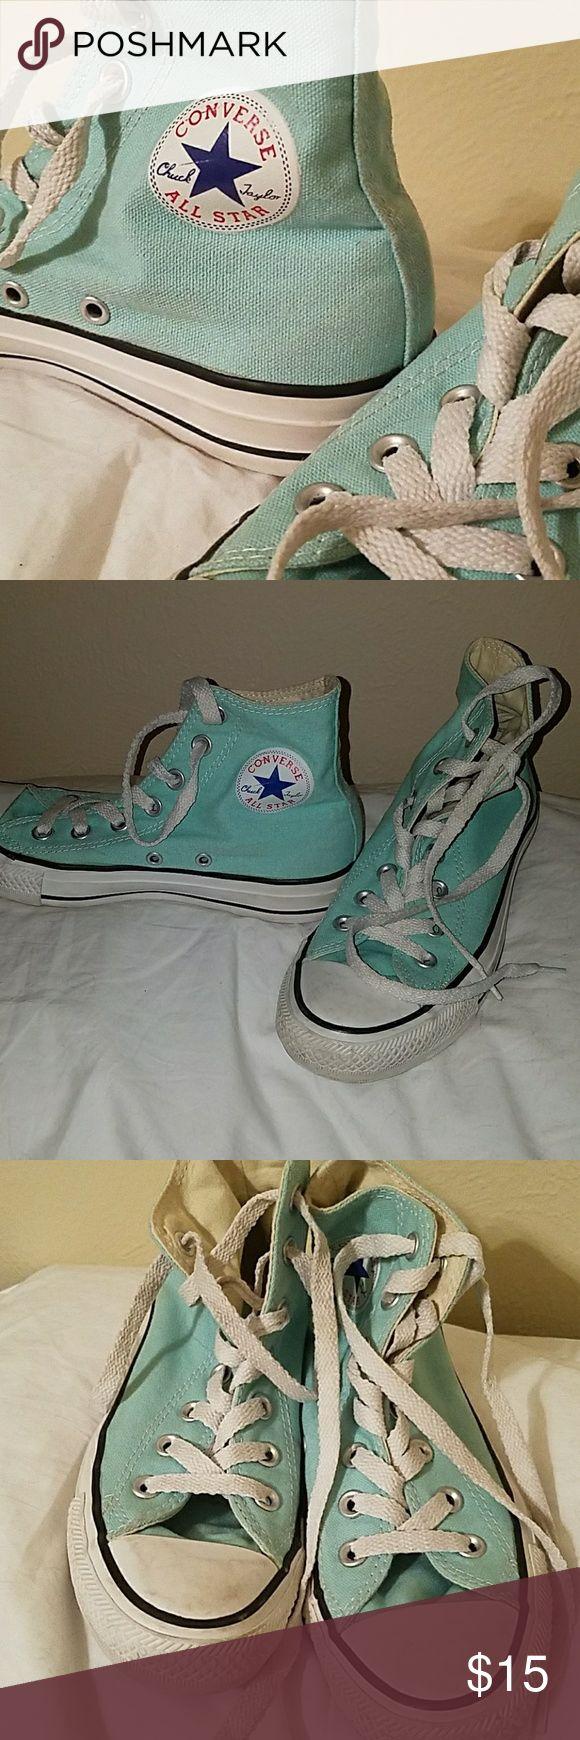 Size 6 turquoise converse hightop original Size 6, original converse hightops Converse Shoes Sneakers